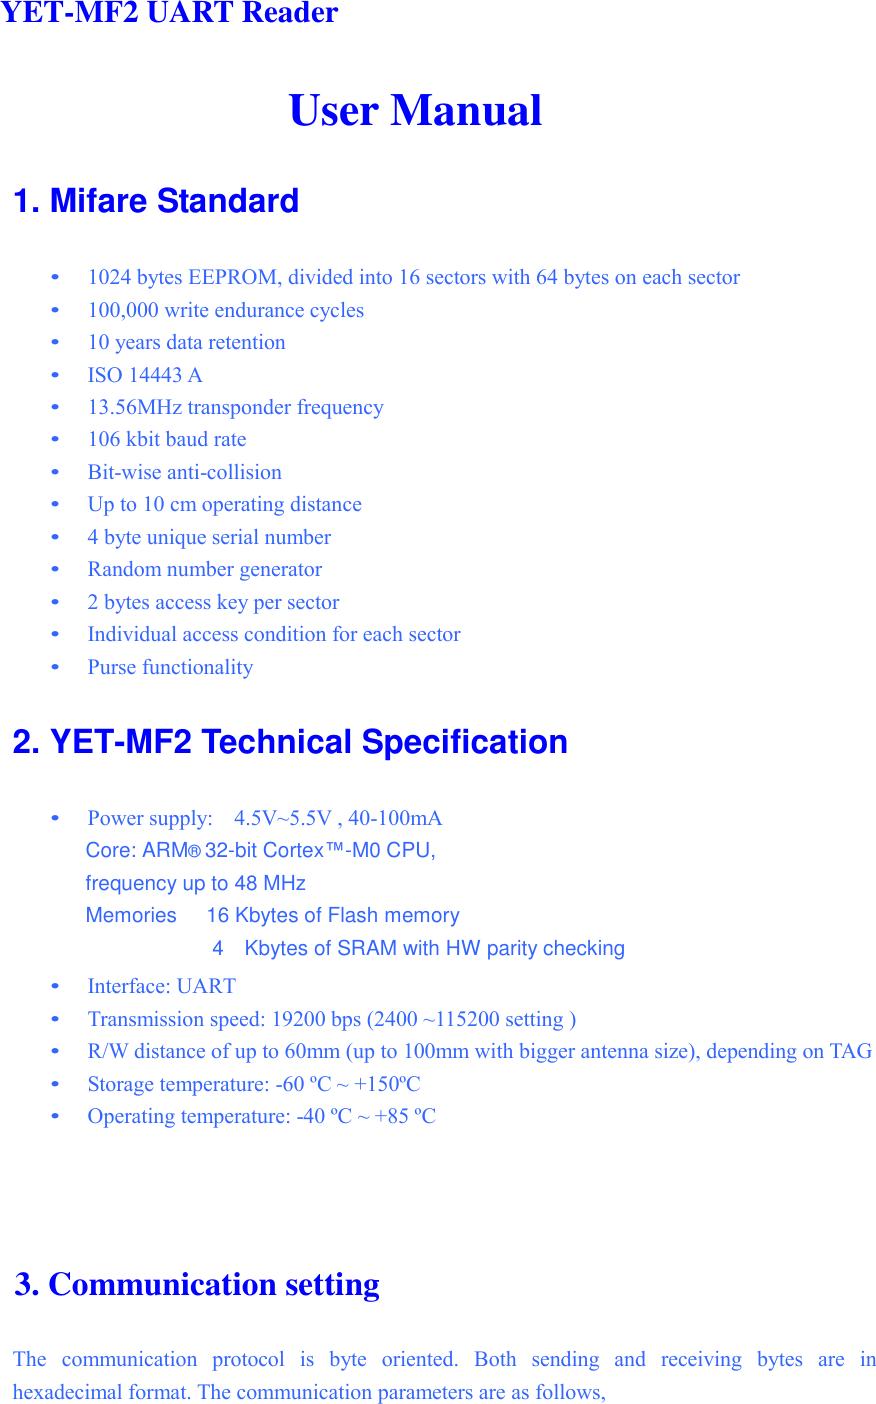 yetong technology YET-MF2 RFID Reader User Manual